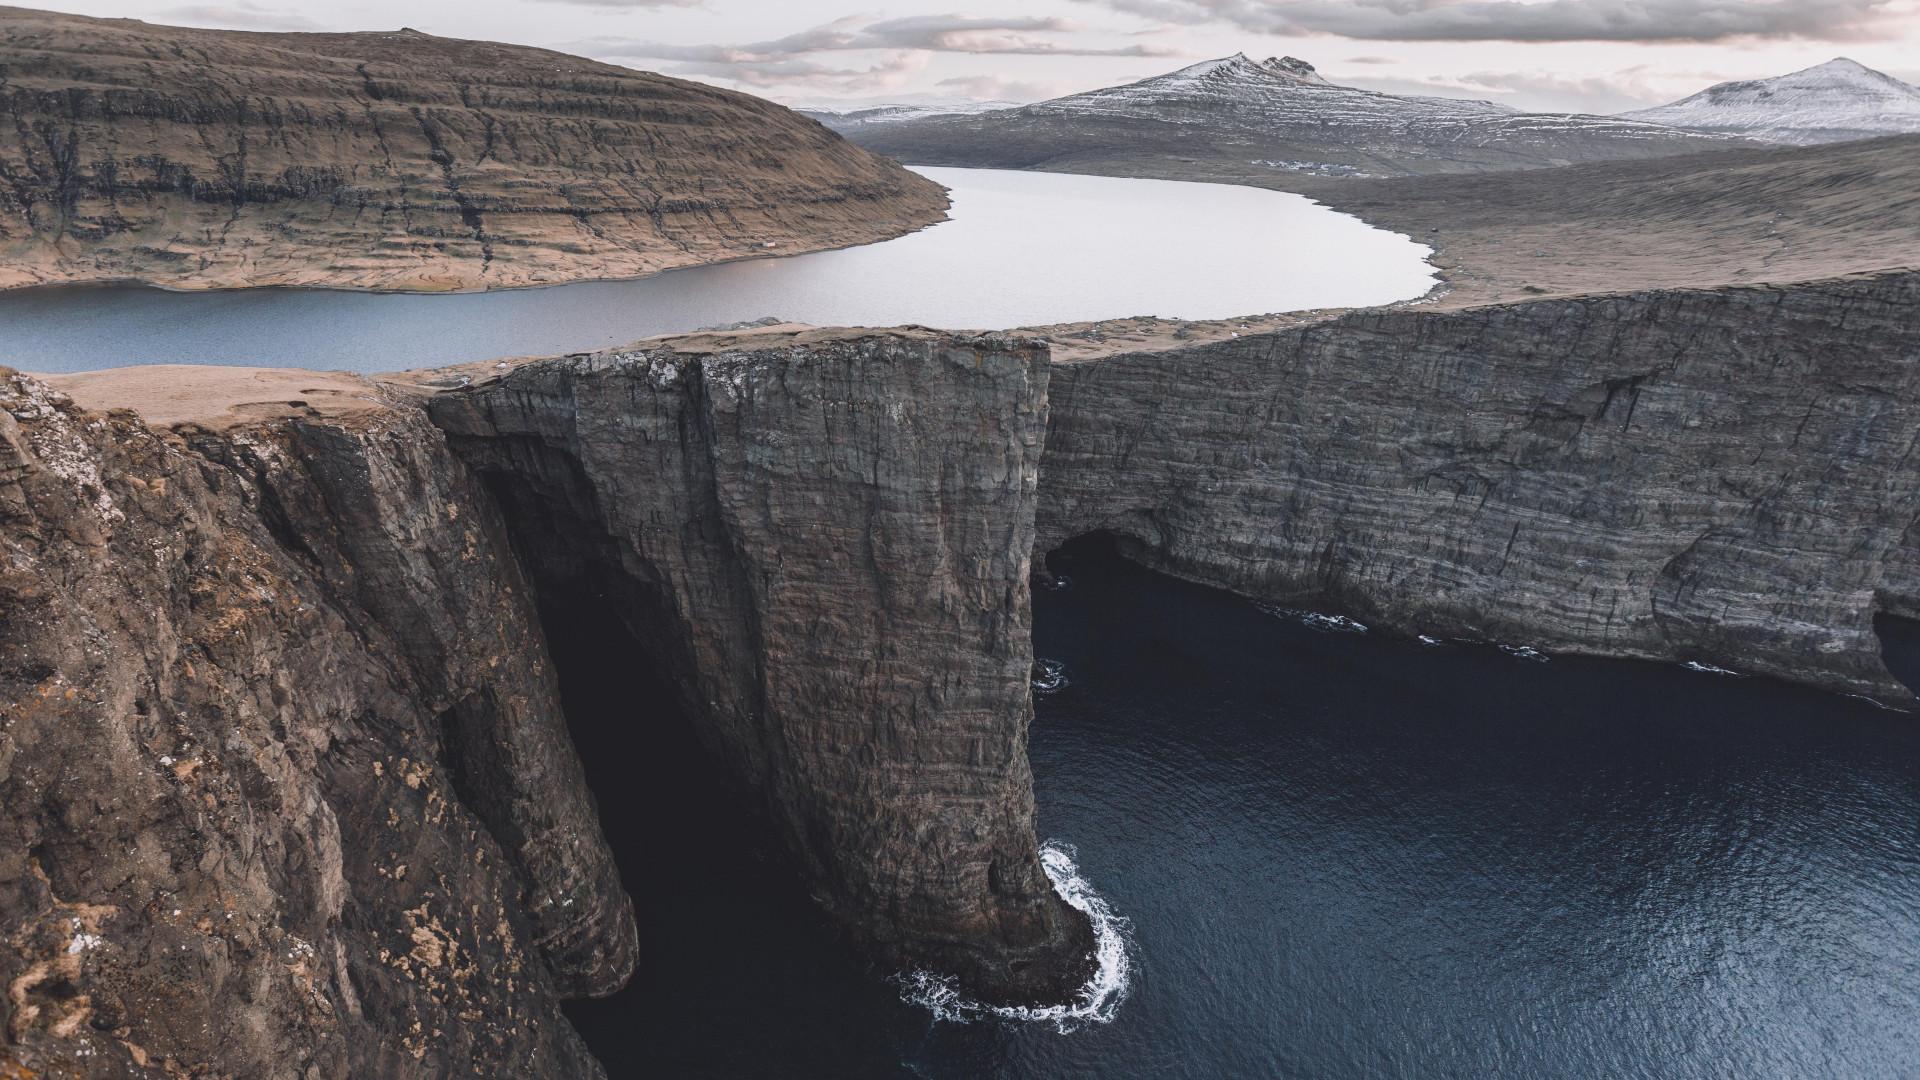 The clifftop lake and sea in Sørásvatn, Faroe Islands